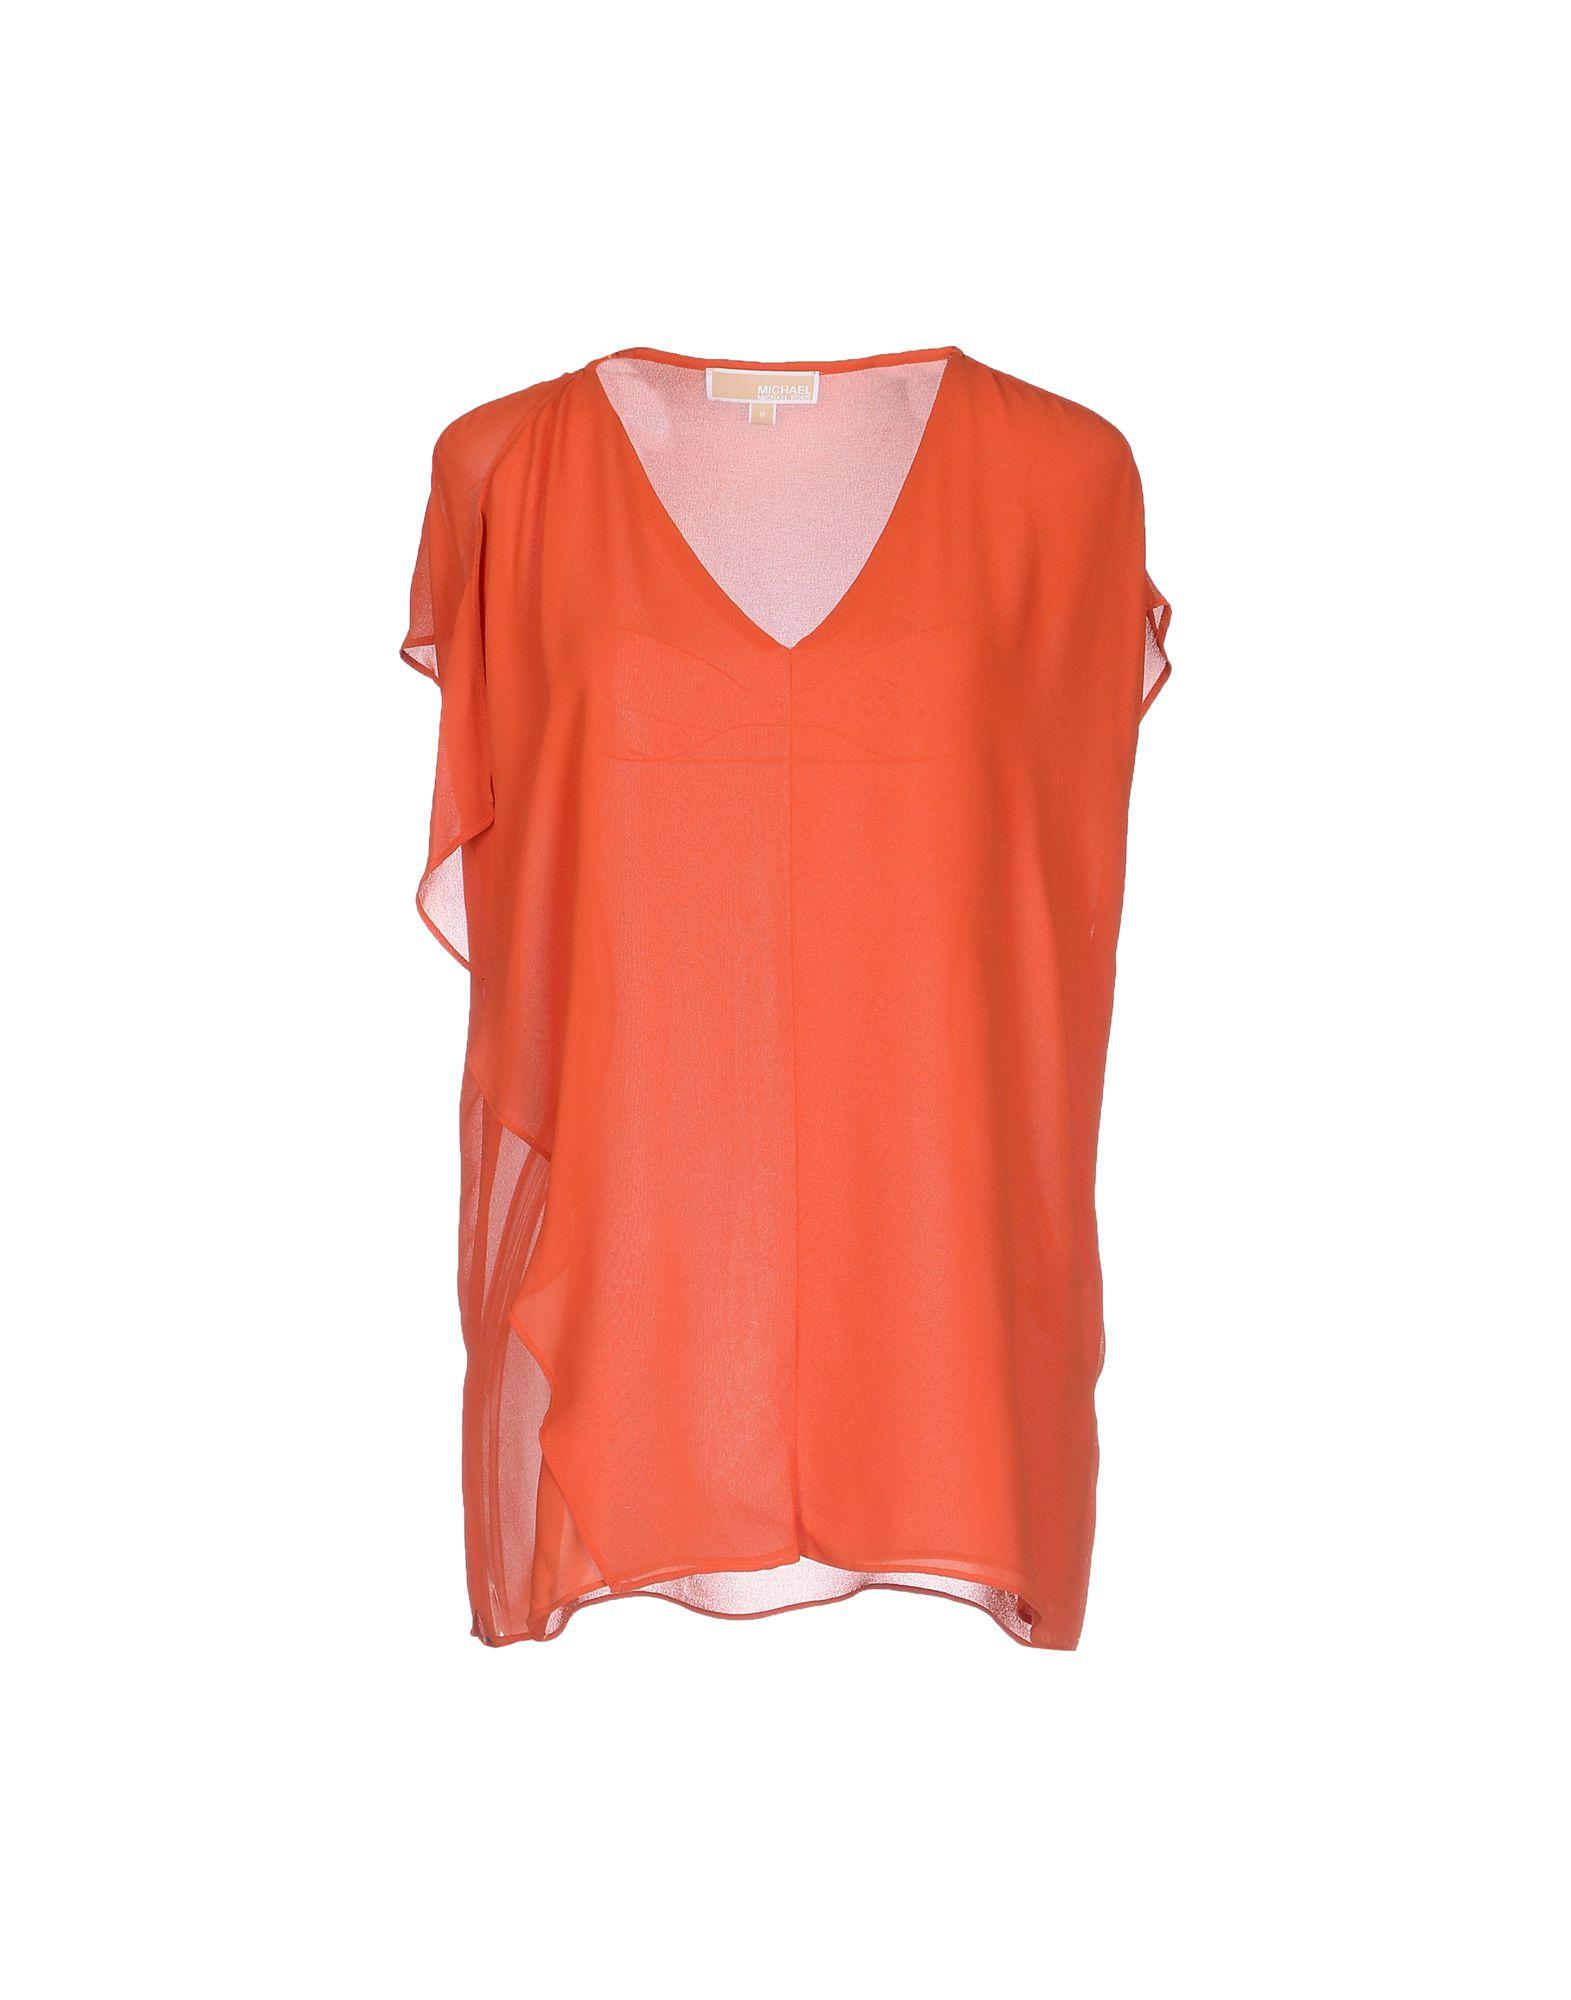 michael michael kors blouse in orange lyst. Black Bedroom Furniture Sets. Home Design Ideas